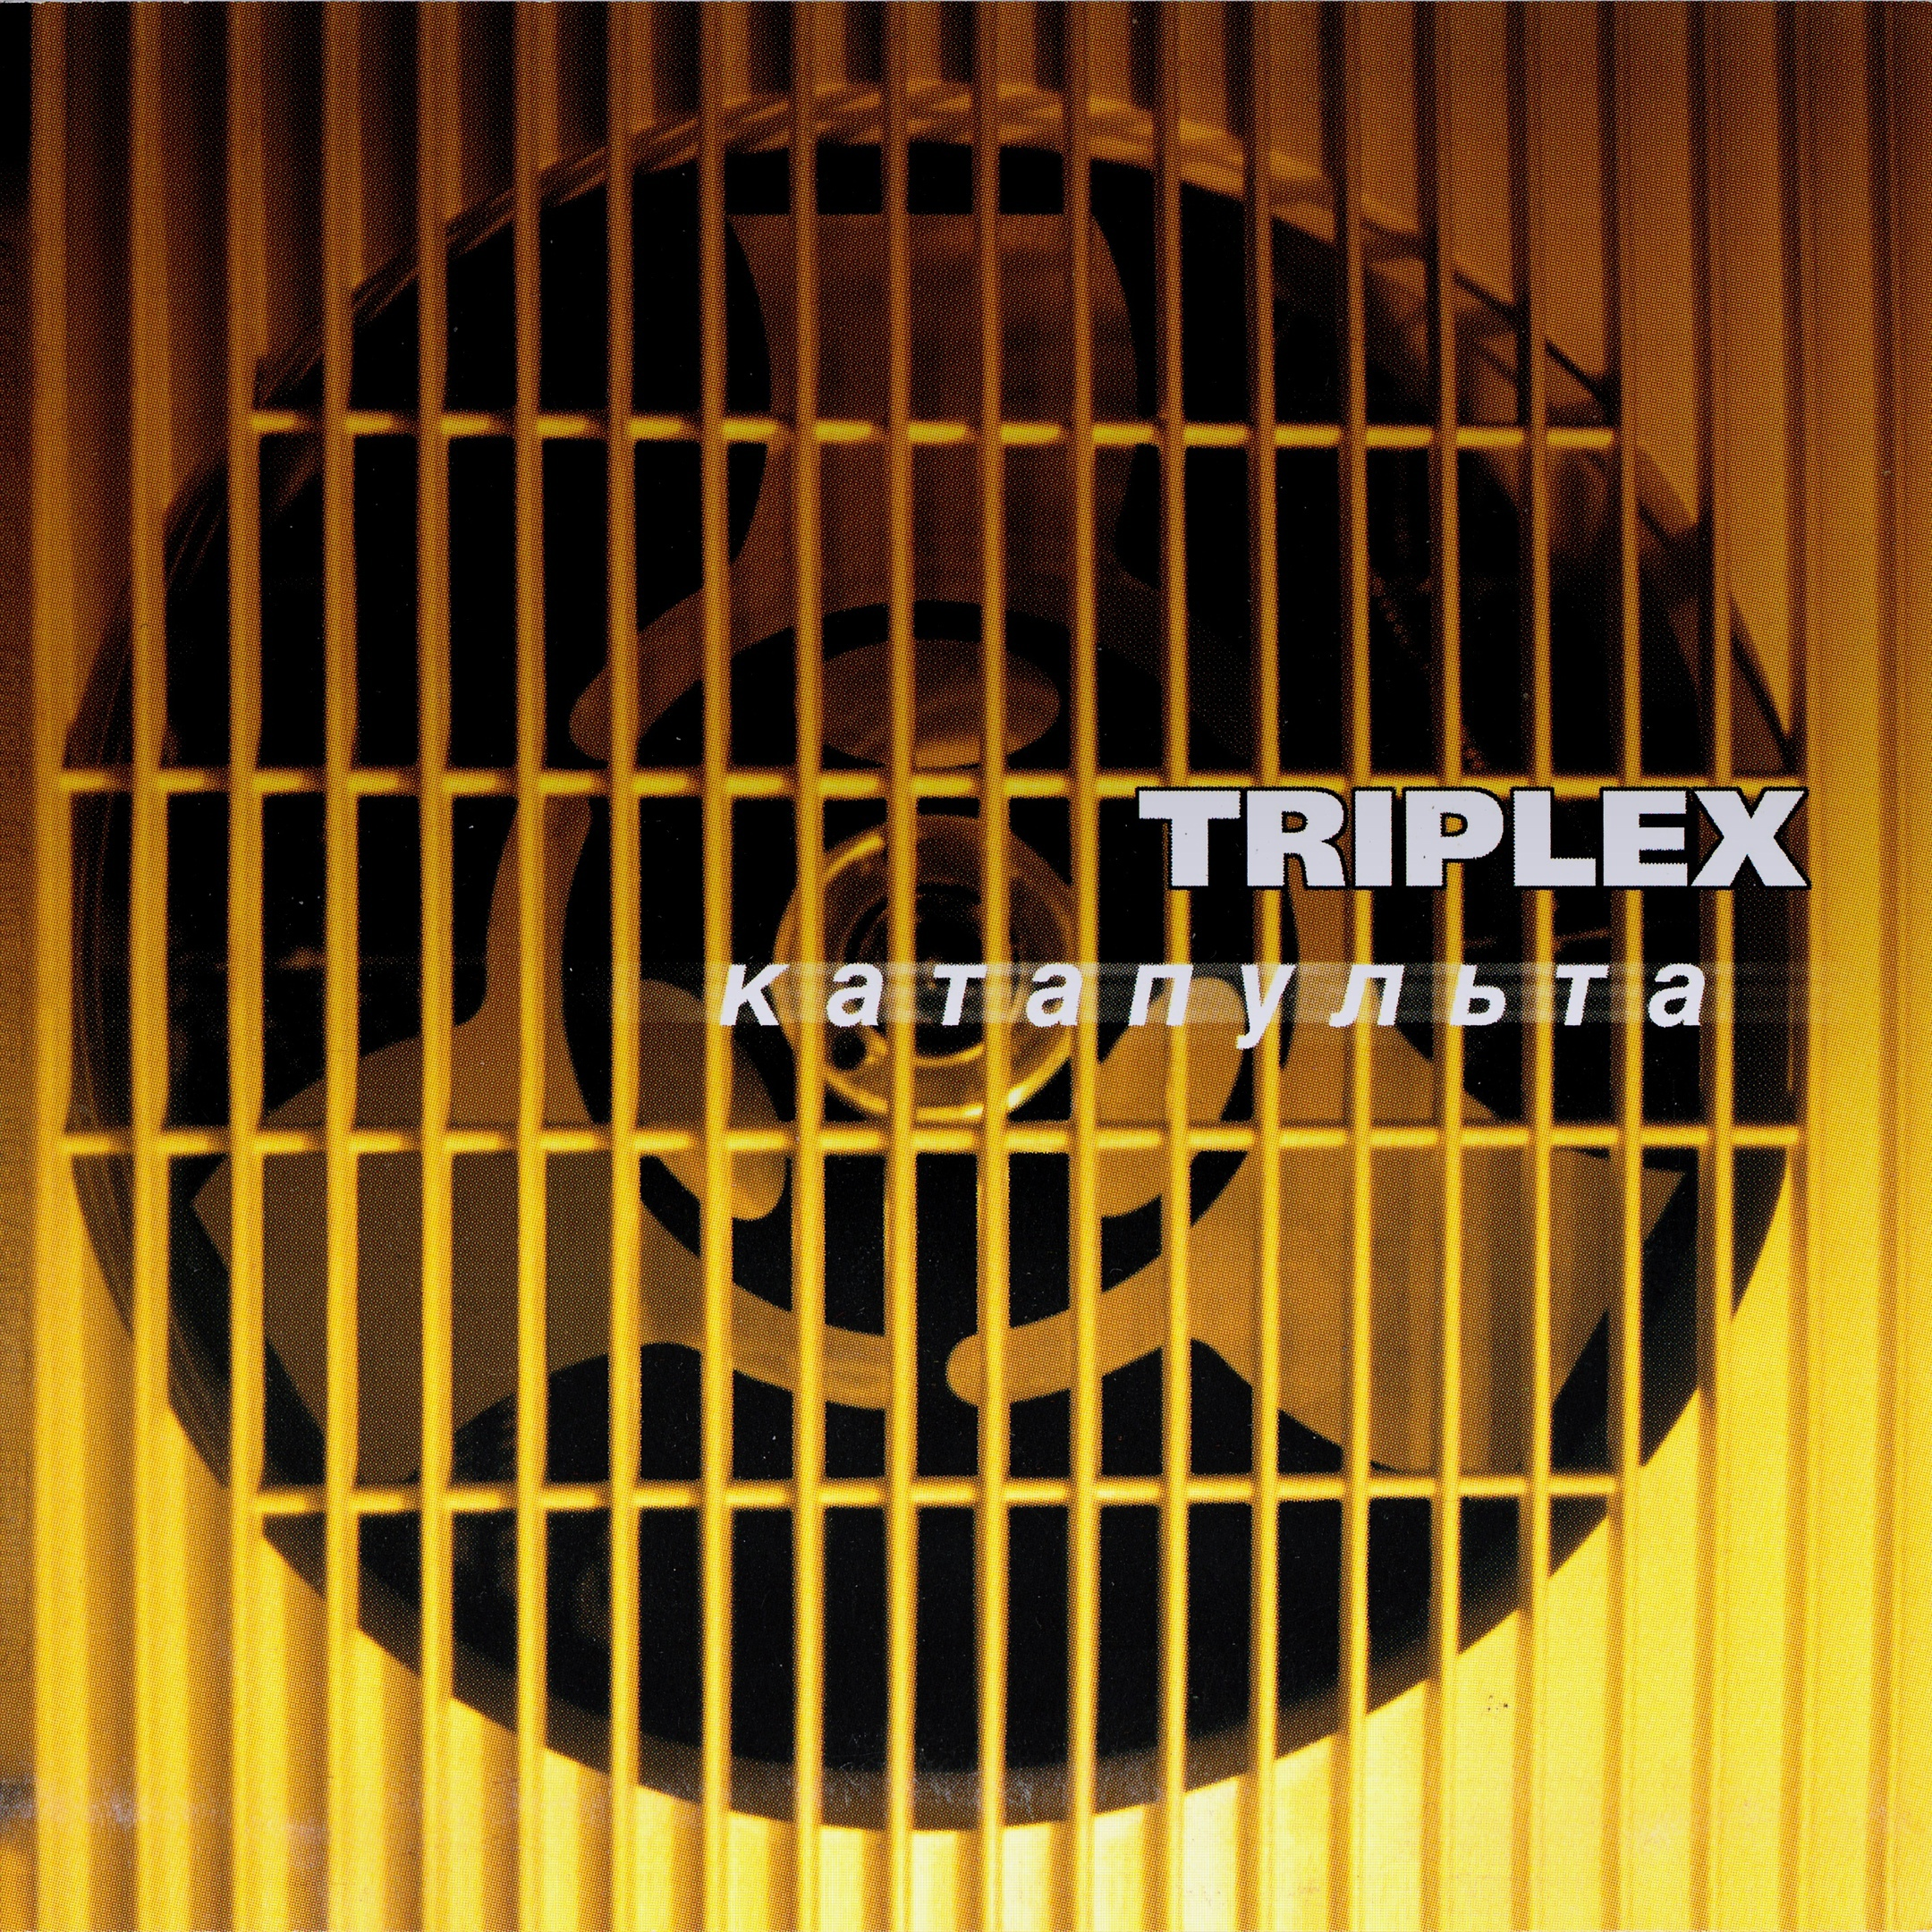 TRIPLEX album Катапульта